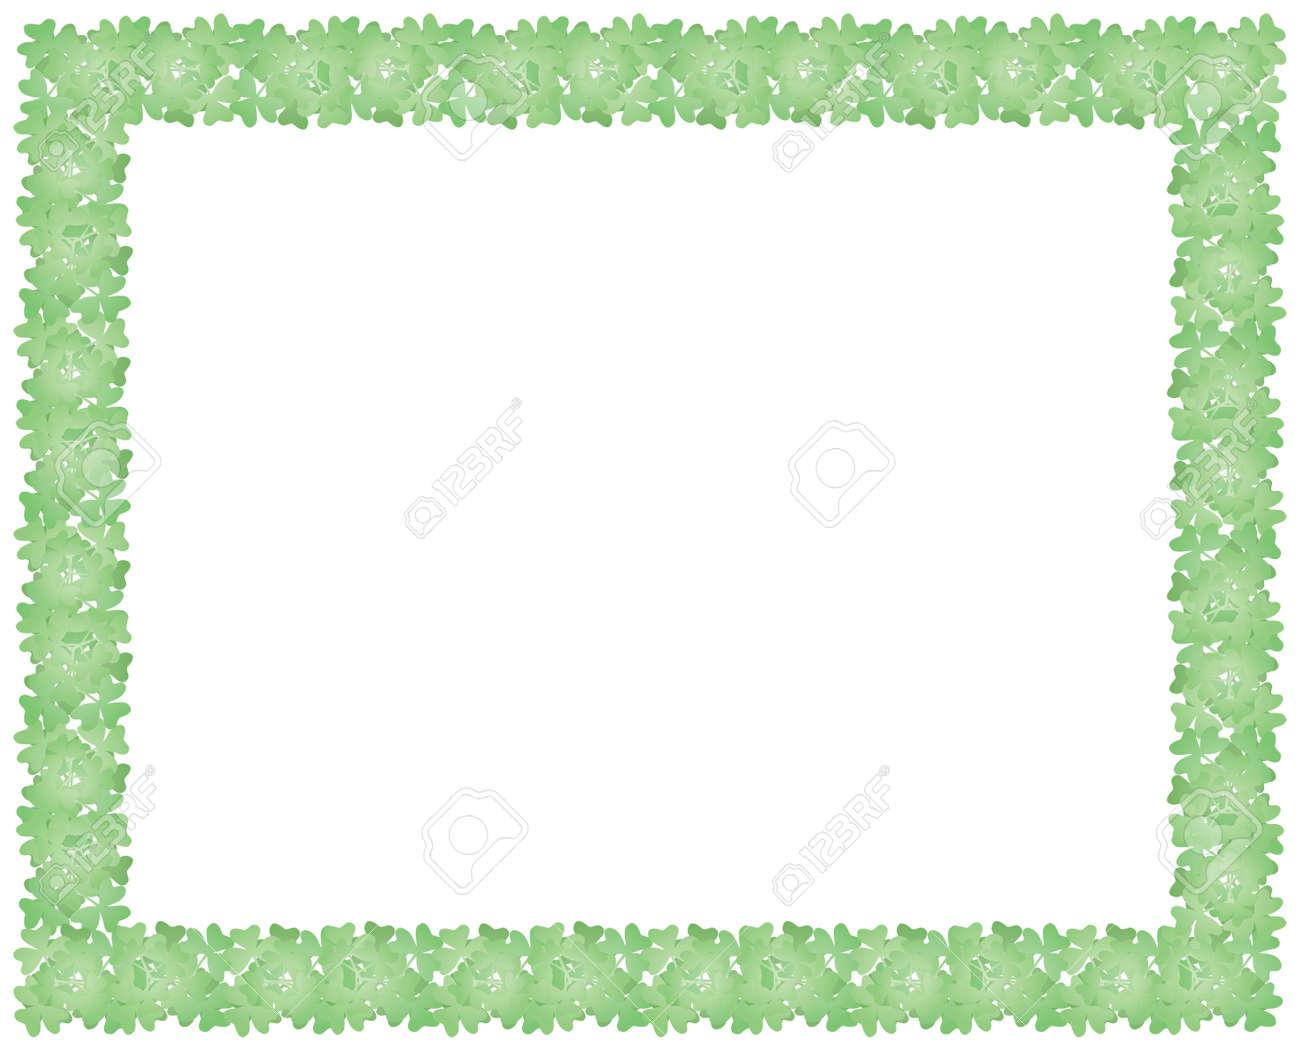 frame made of shamrock leaves for St Patricks Day holiday backround Stock Vector - 17619485